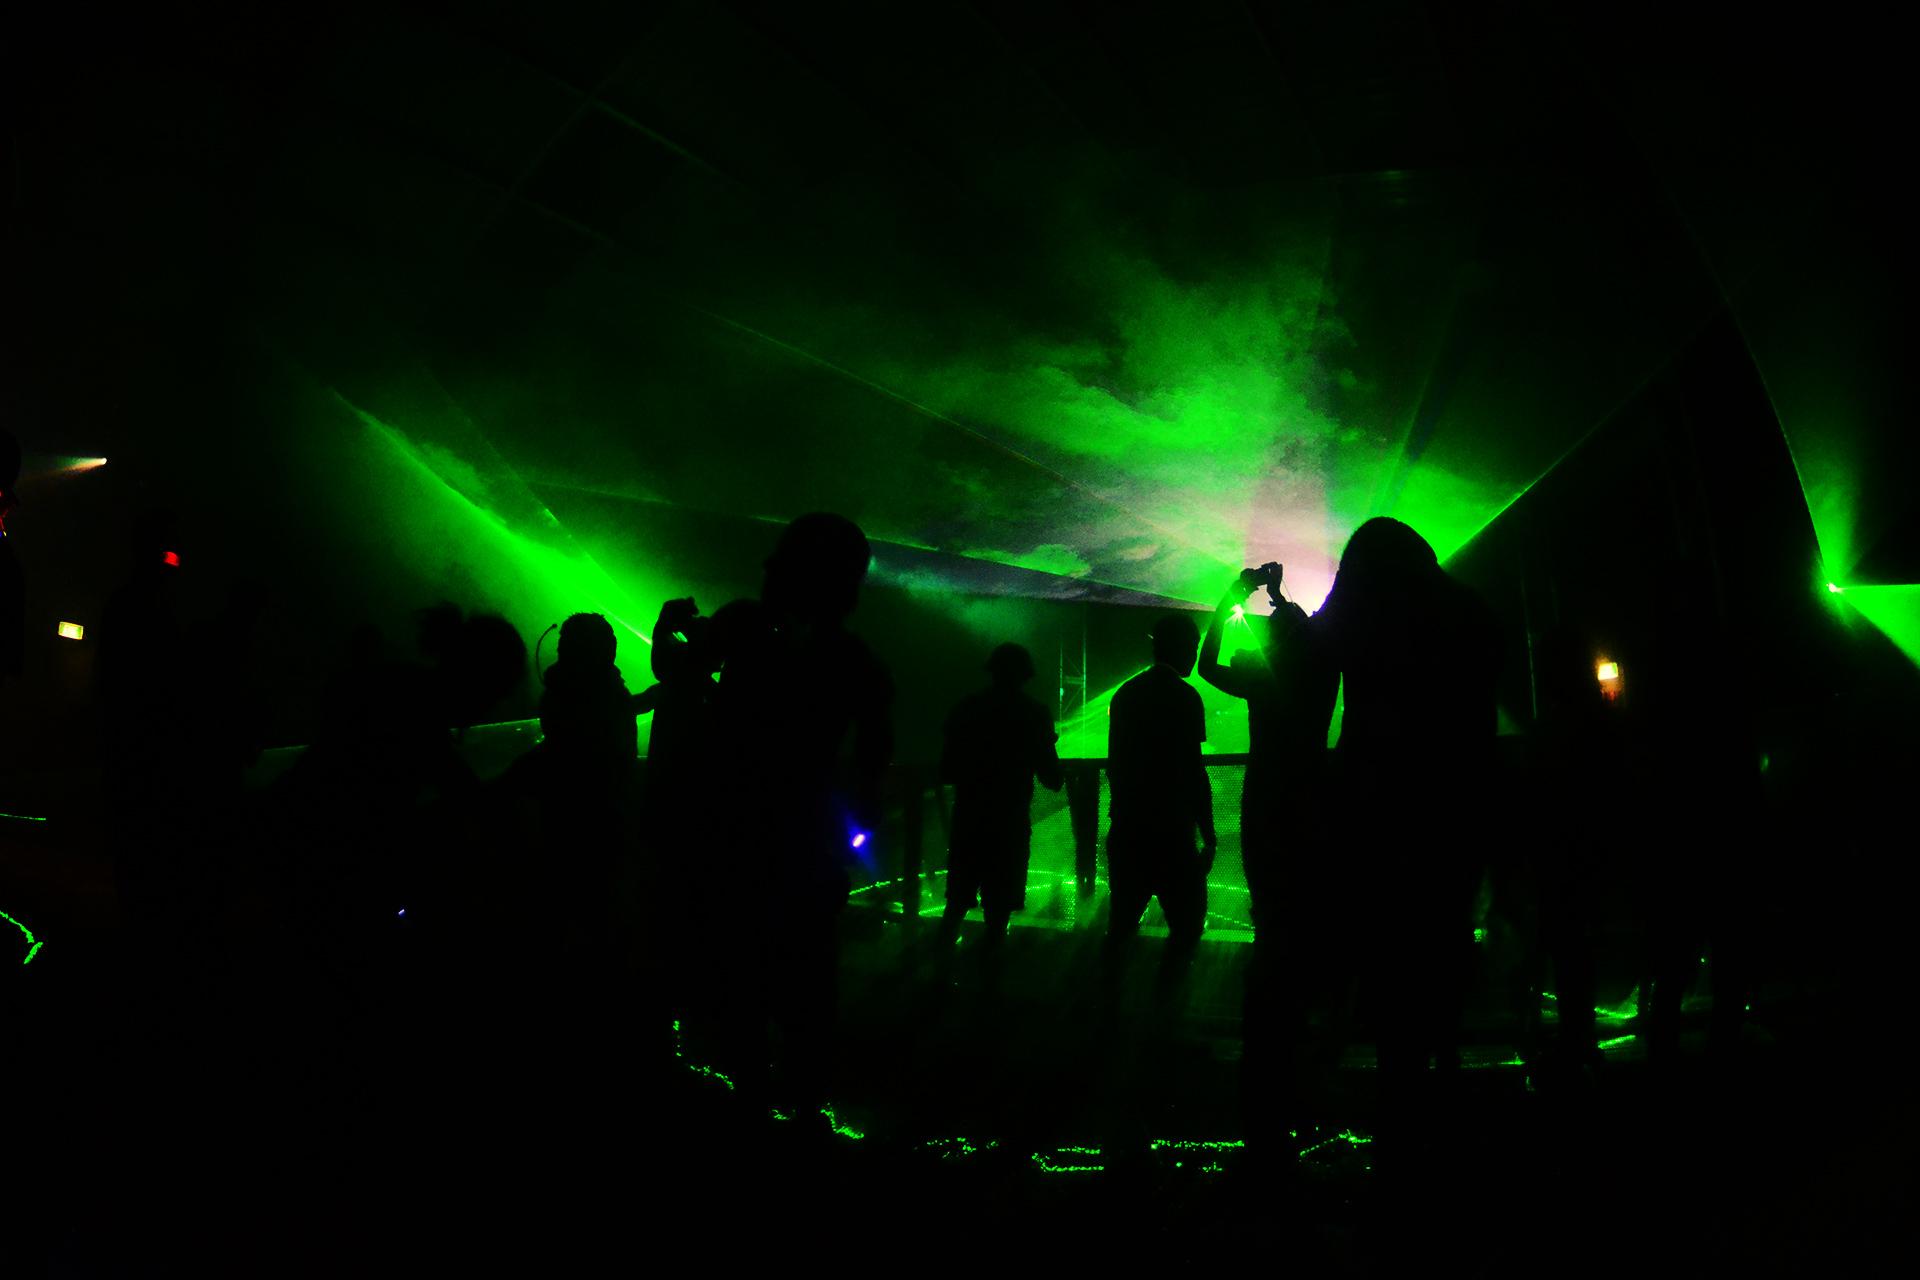 2010-10-22 - Tasmania - Carrick - Signature Festival - D3100-0568.jpg